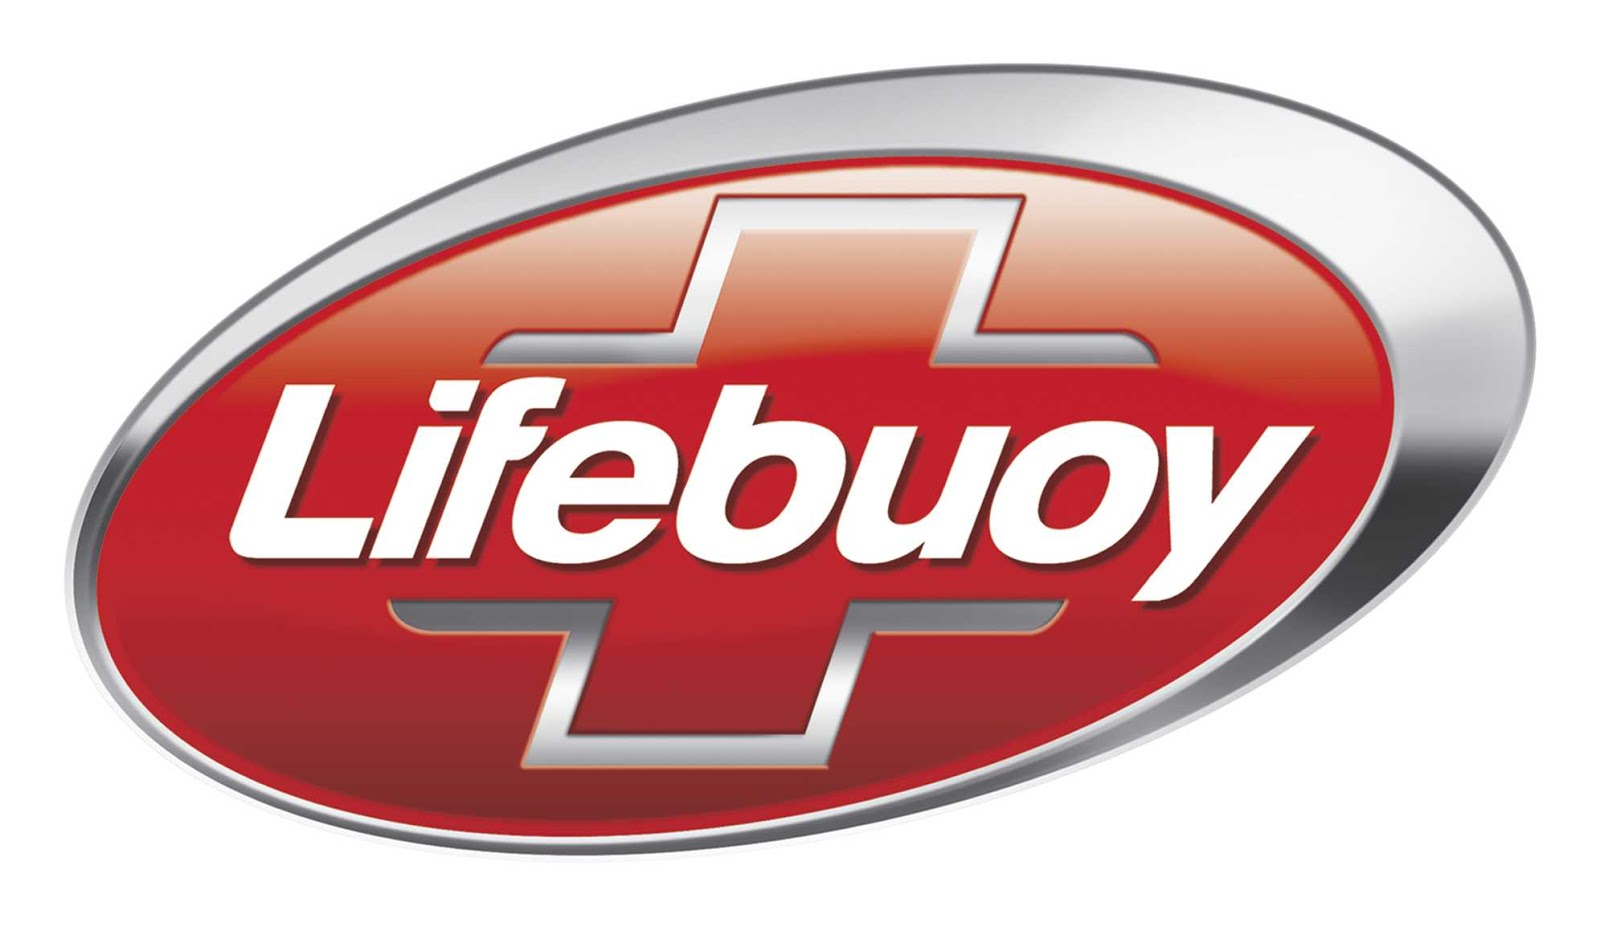 Manajemenbr Strategi Pemasaran Lifebuoy Sabun Mandi Harmoni Friday June 10 2016